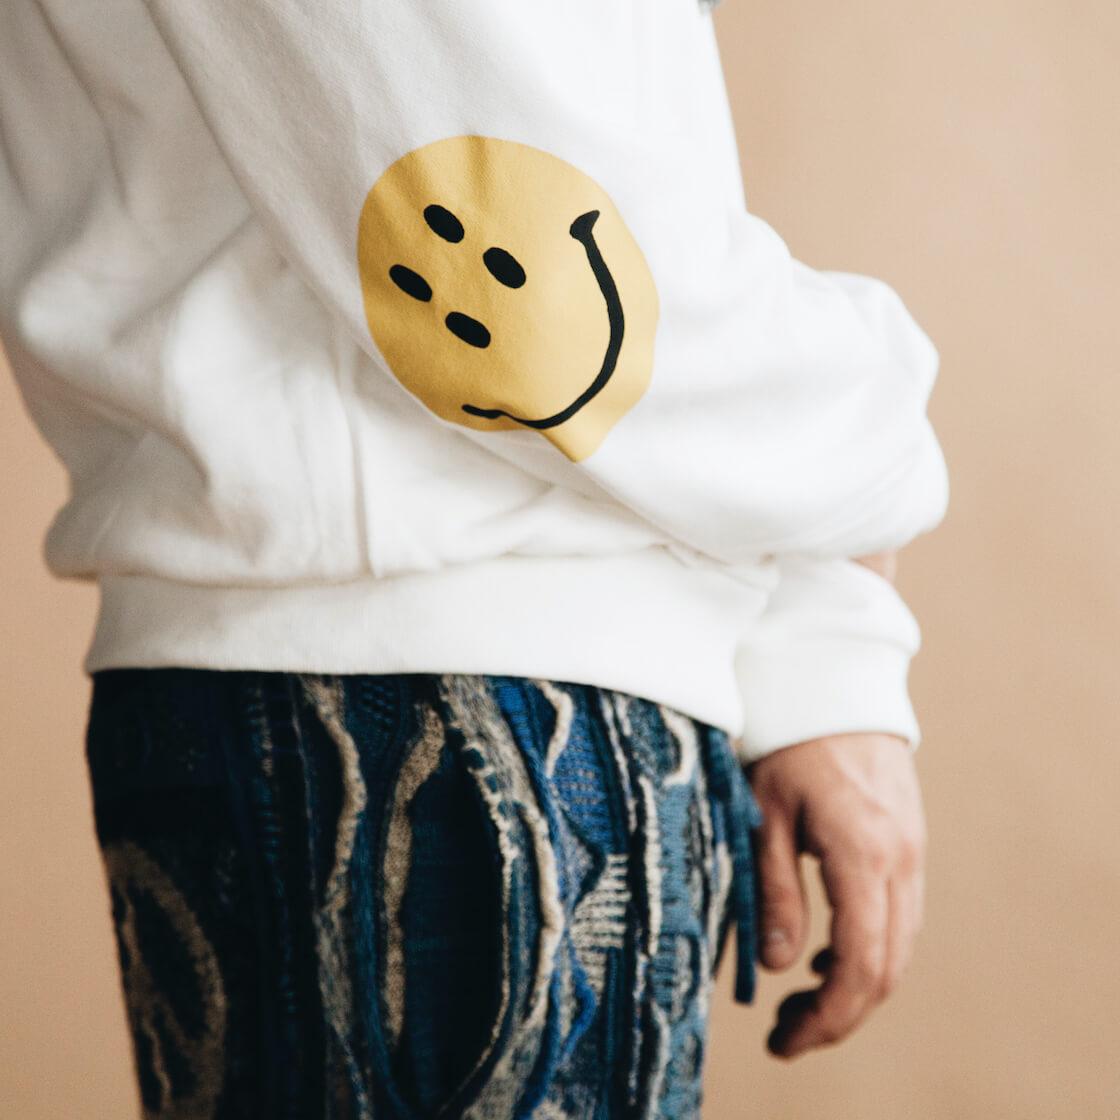 kapital eco jersey (smilie elbow) sweatshirt and 7g knit boro gaudy pants on body